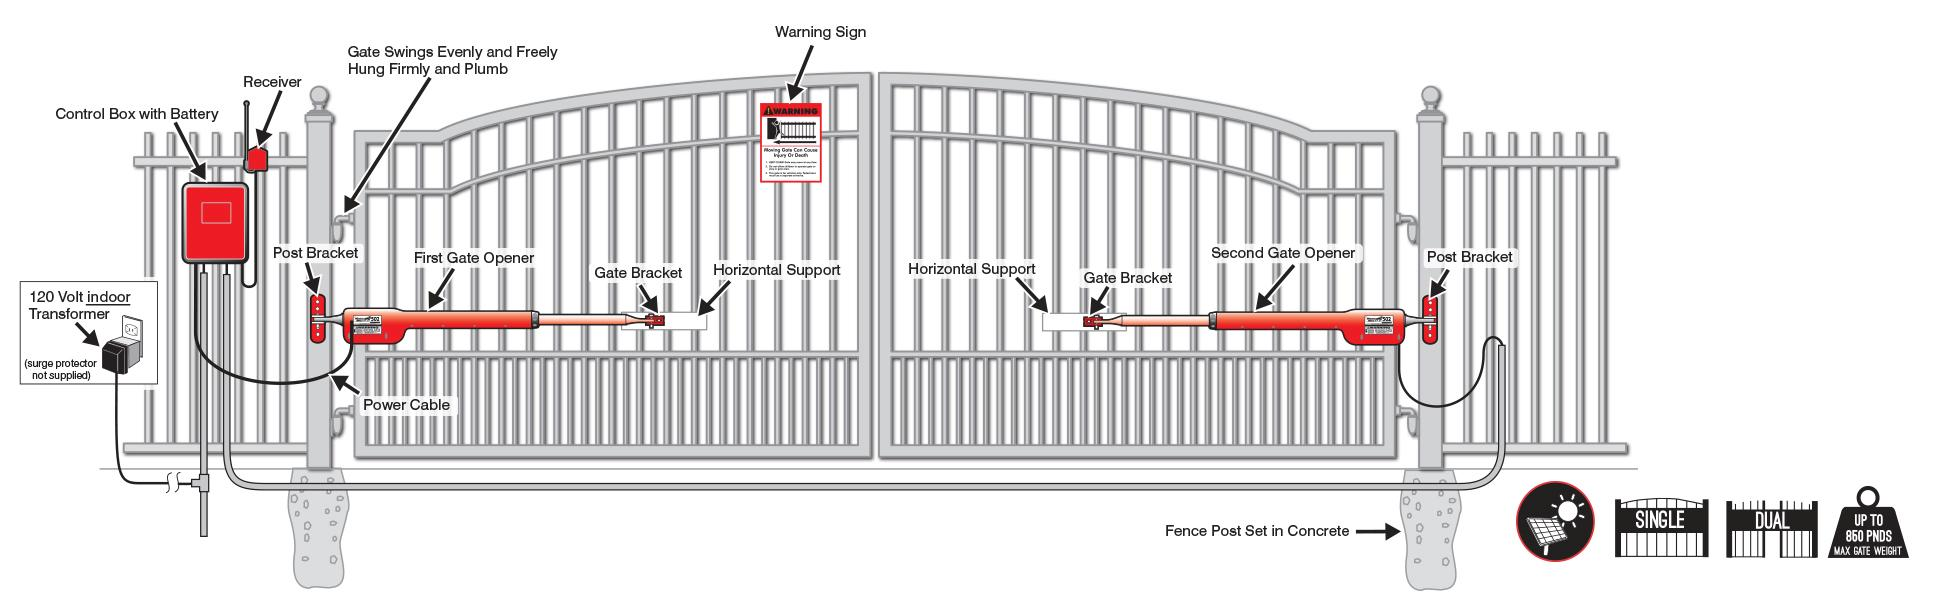 hight resolution of acf00874 da50 48a4 bd17 e91c0e7d2ad1 v326979210 gate opener wiring diagram wiring library